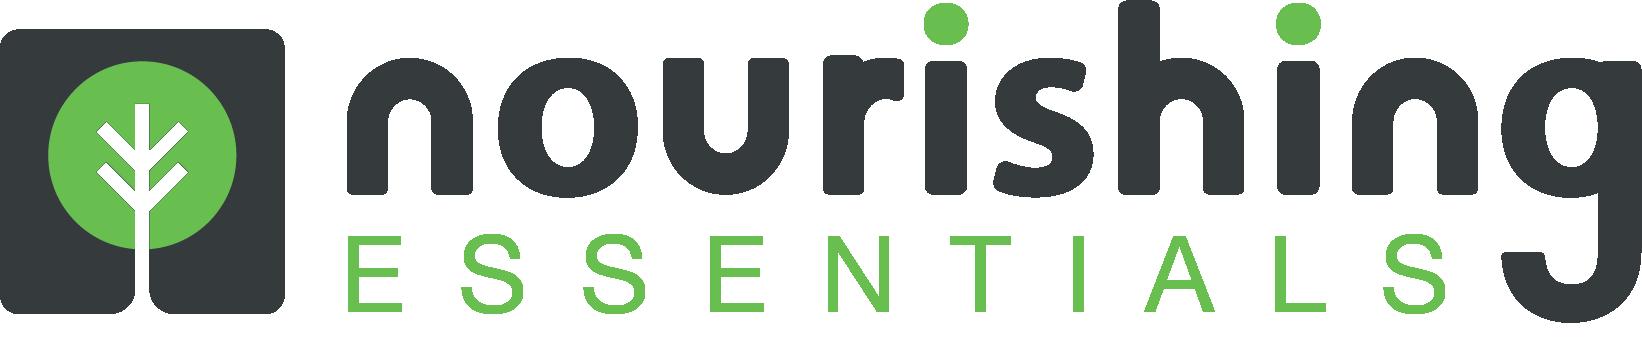 Nourishing Essentials Logo